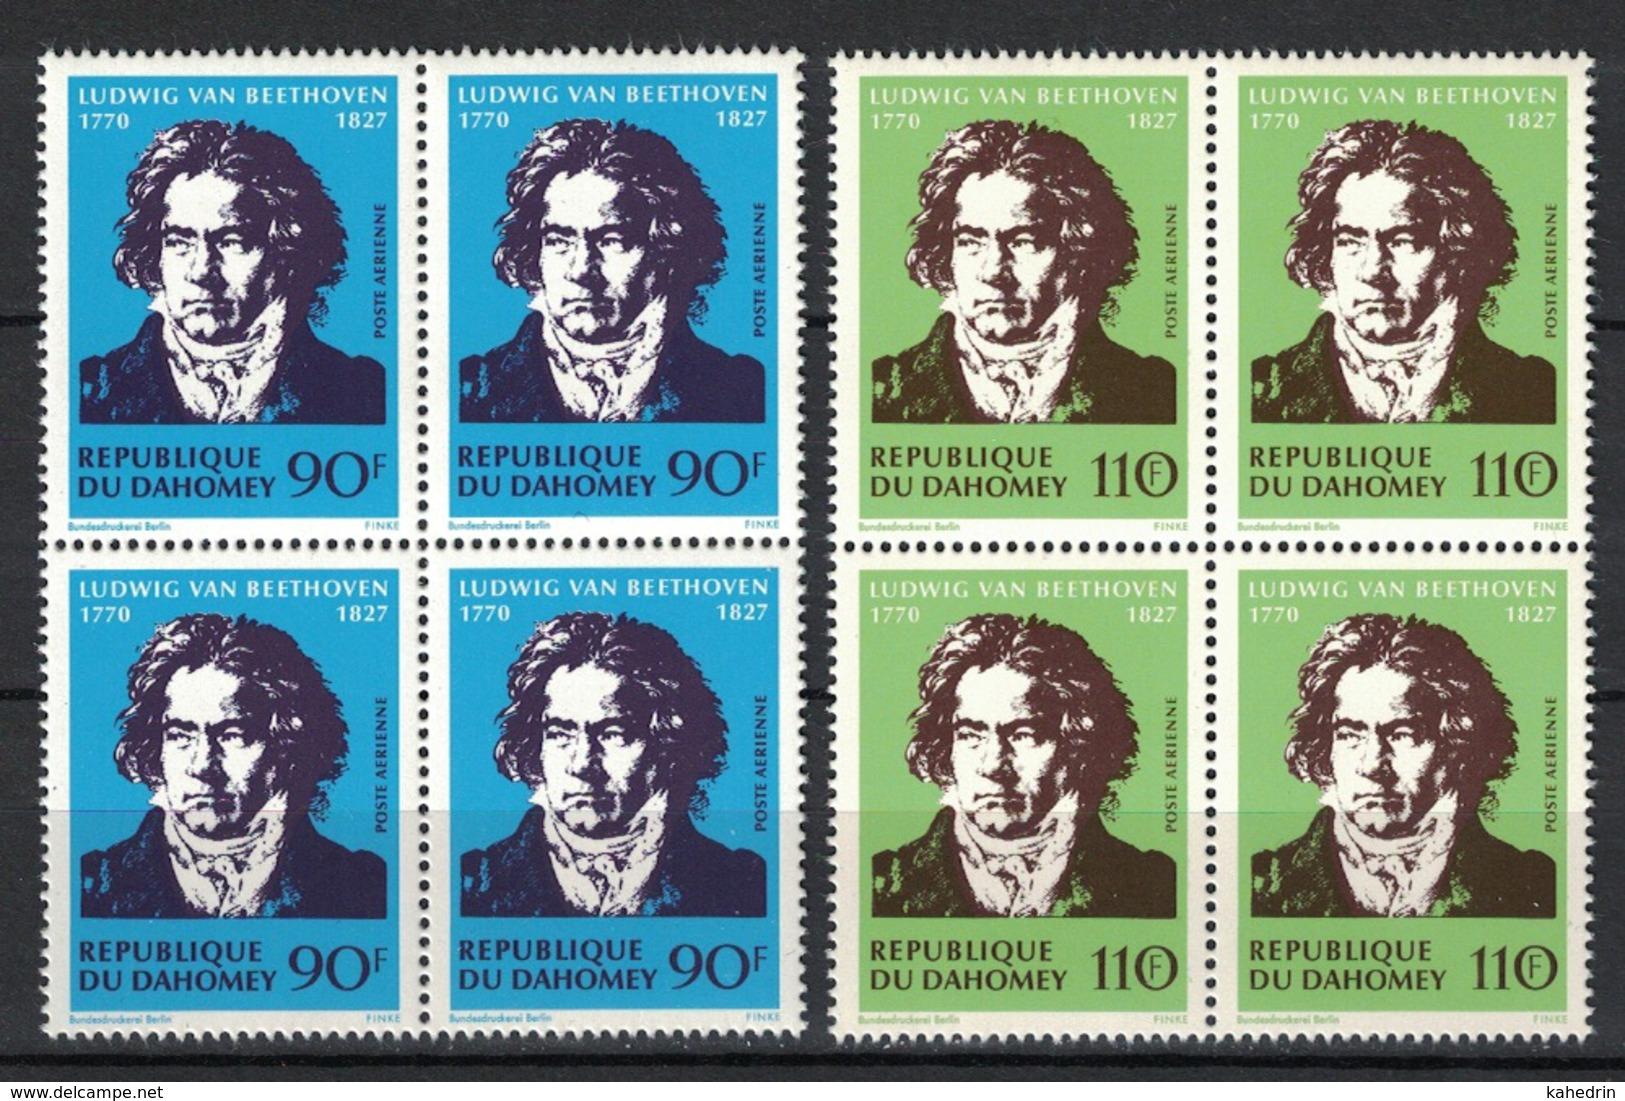 Dahomey 1970, Ludwig Van Beethoven / Music / Composer **, MNH - Bénin – Dahomey (1960-...)